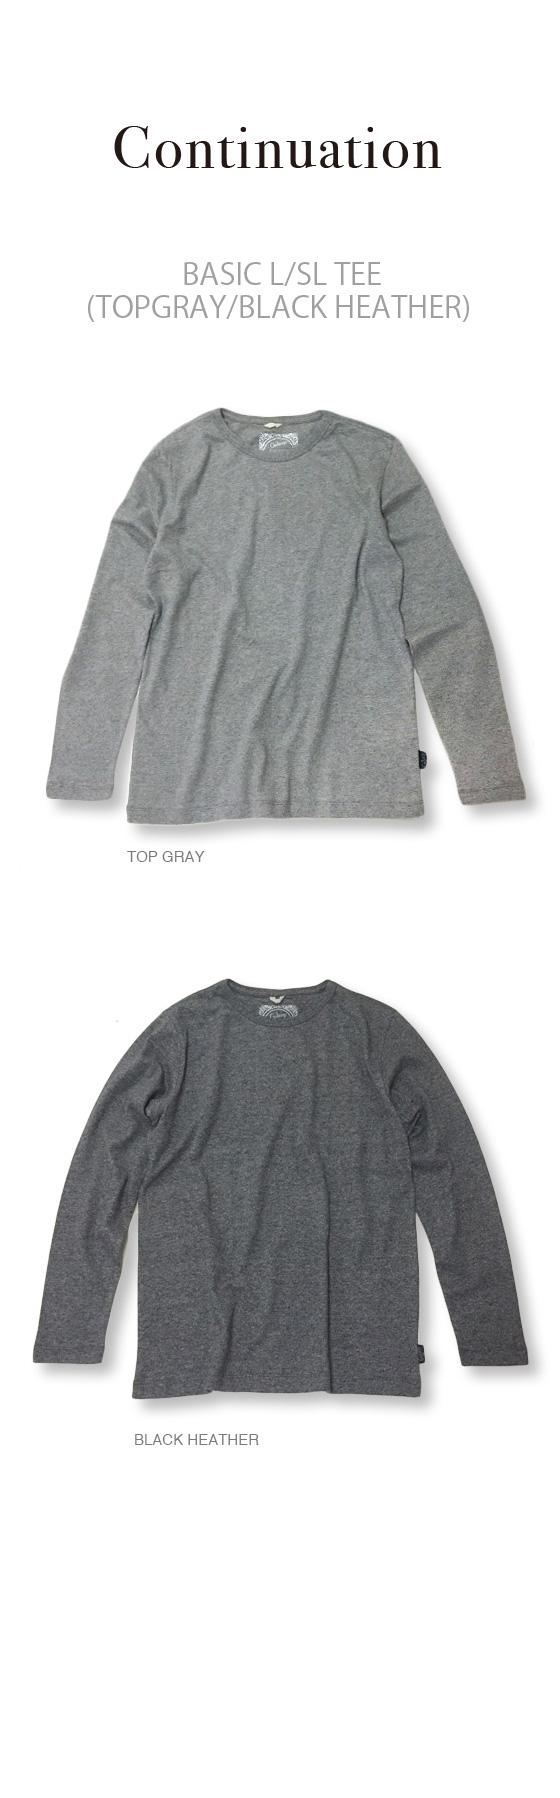 BASIC L/SL TEE/(TOPGRAY/BLACK HEATHER)